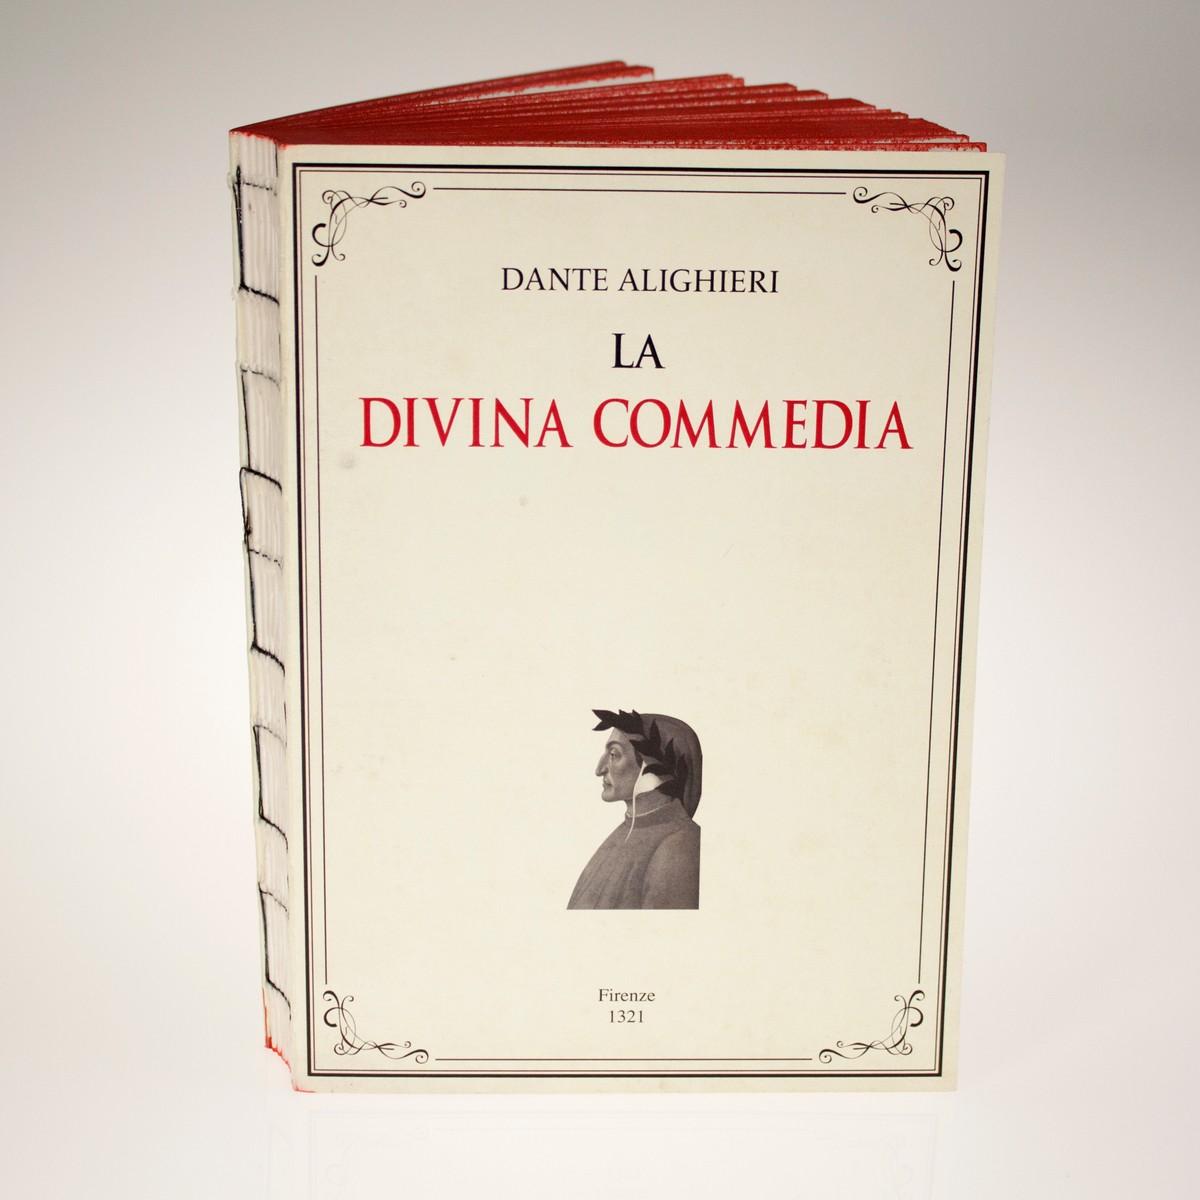 Photo of La Divina Commedia Notebook